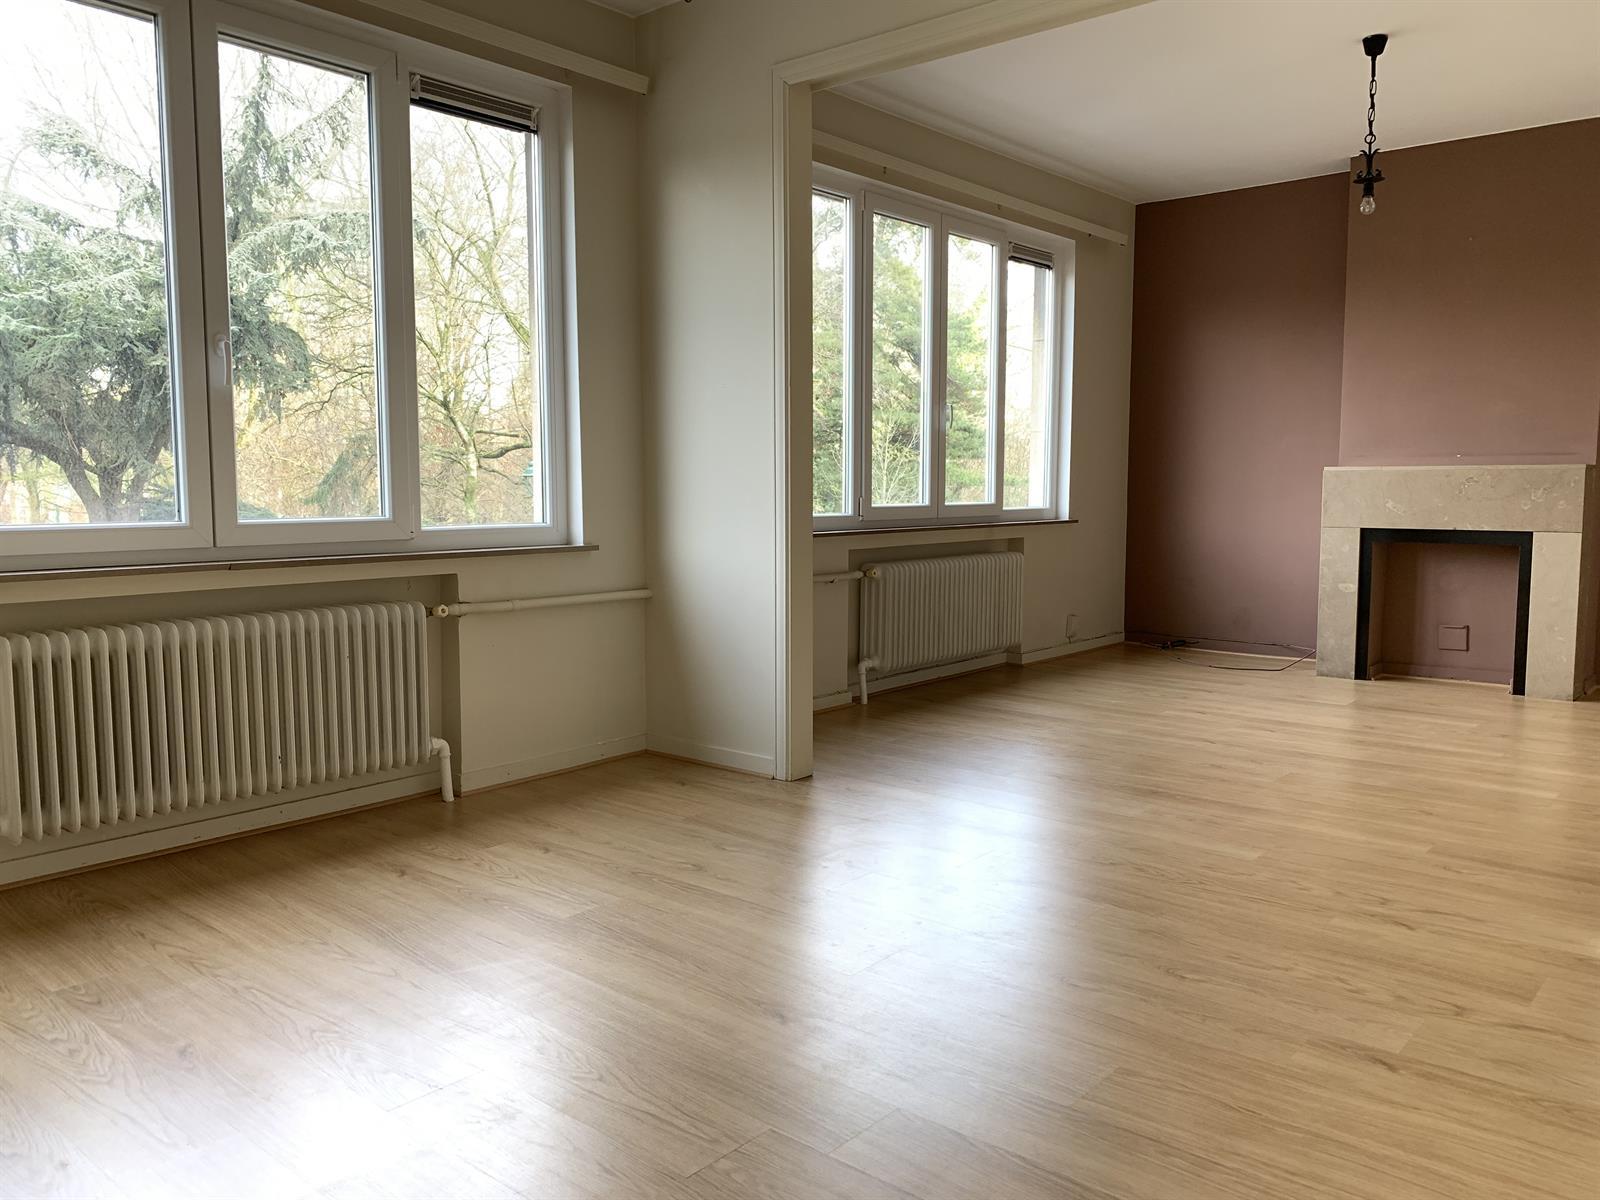 Flat - Molenbeek-Saint-Jean - #3956375-14